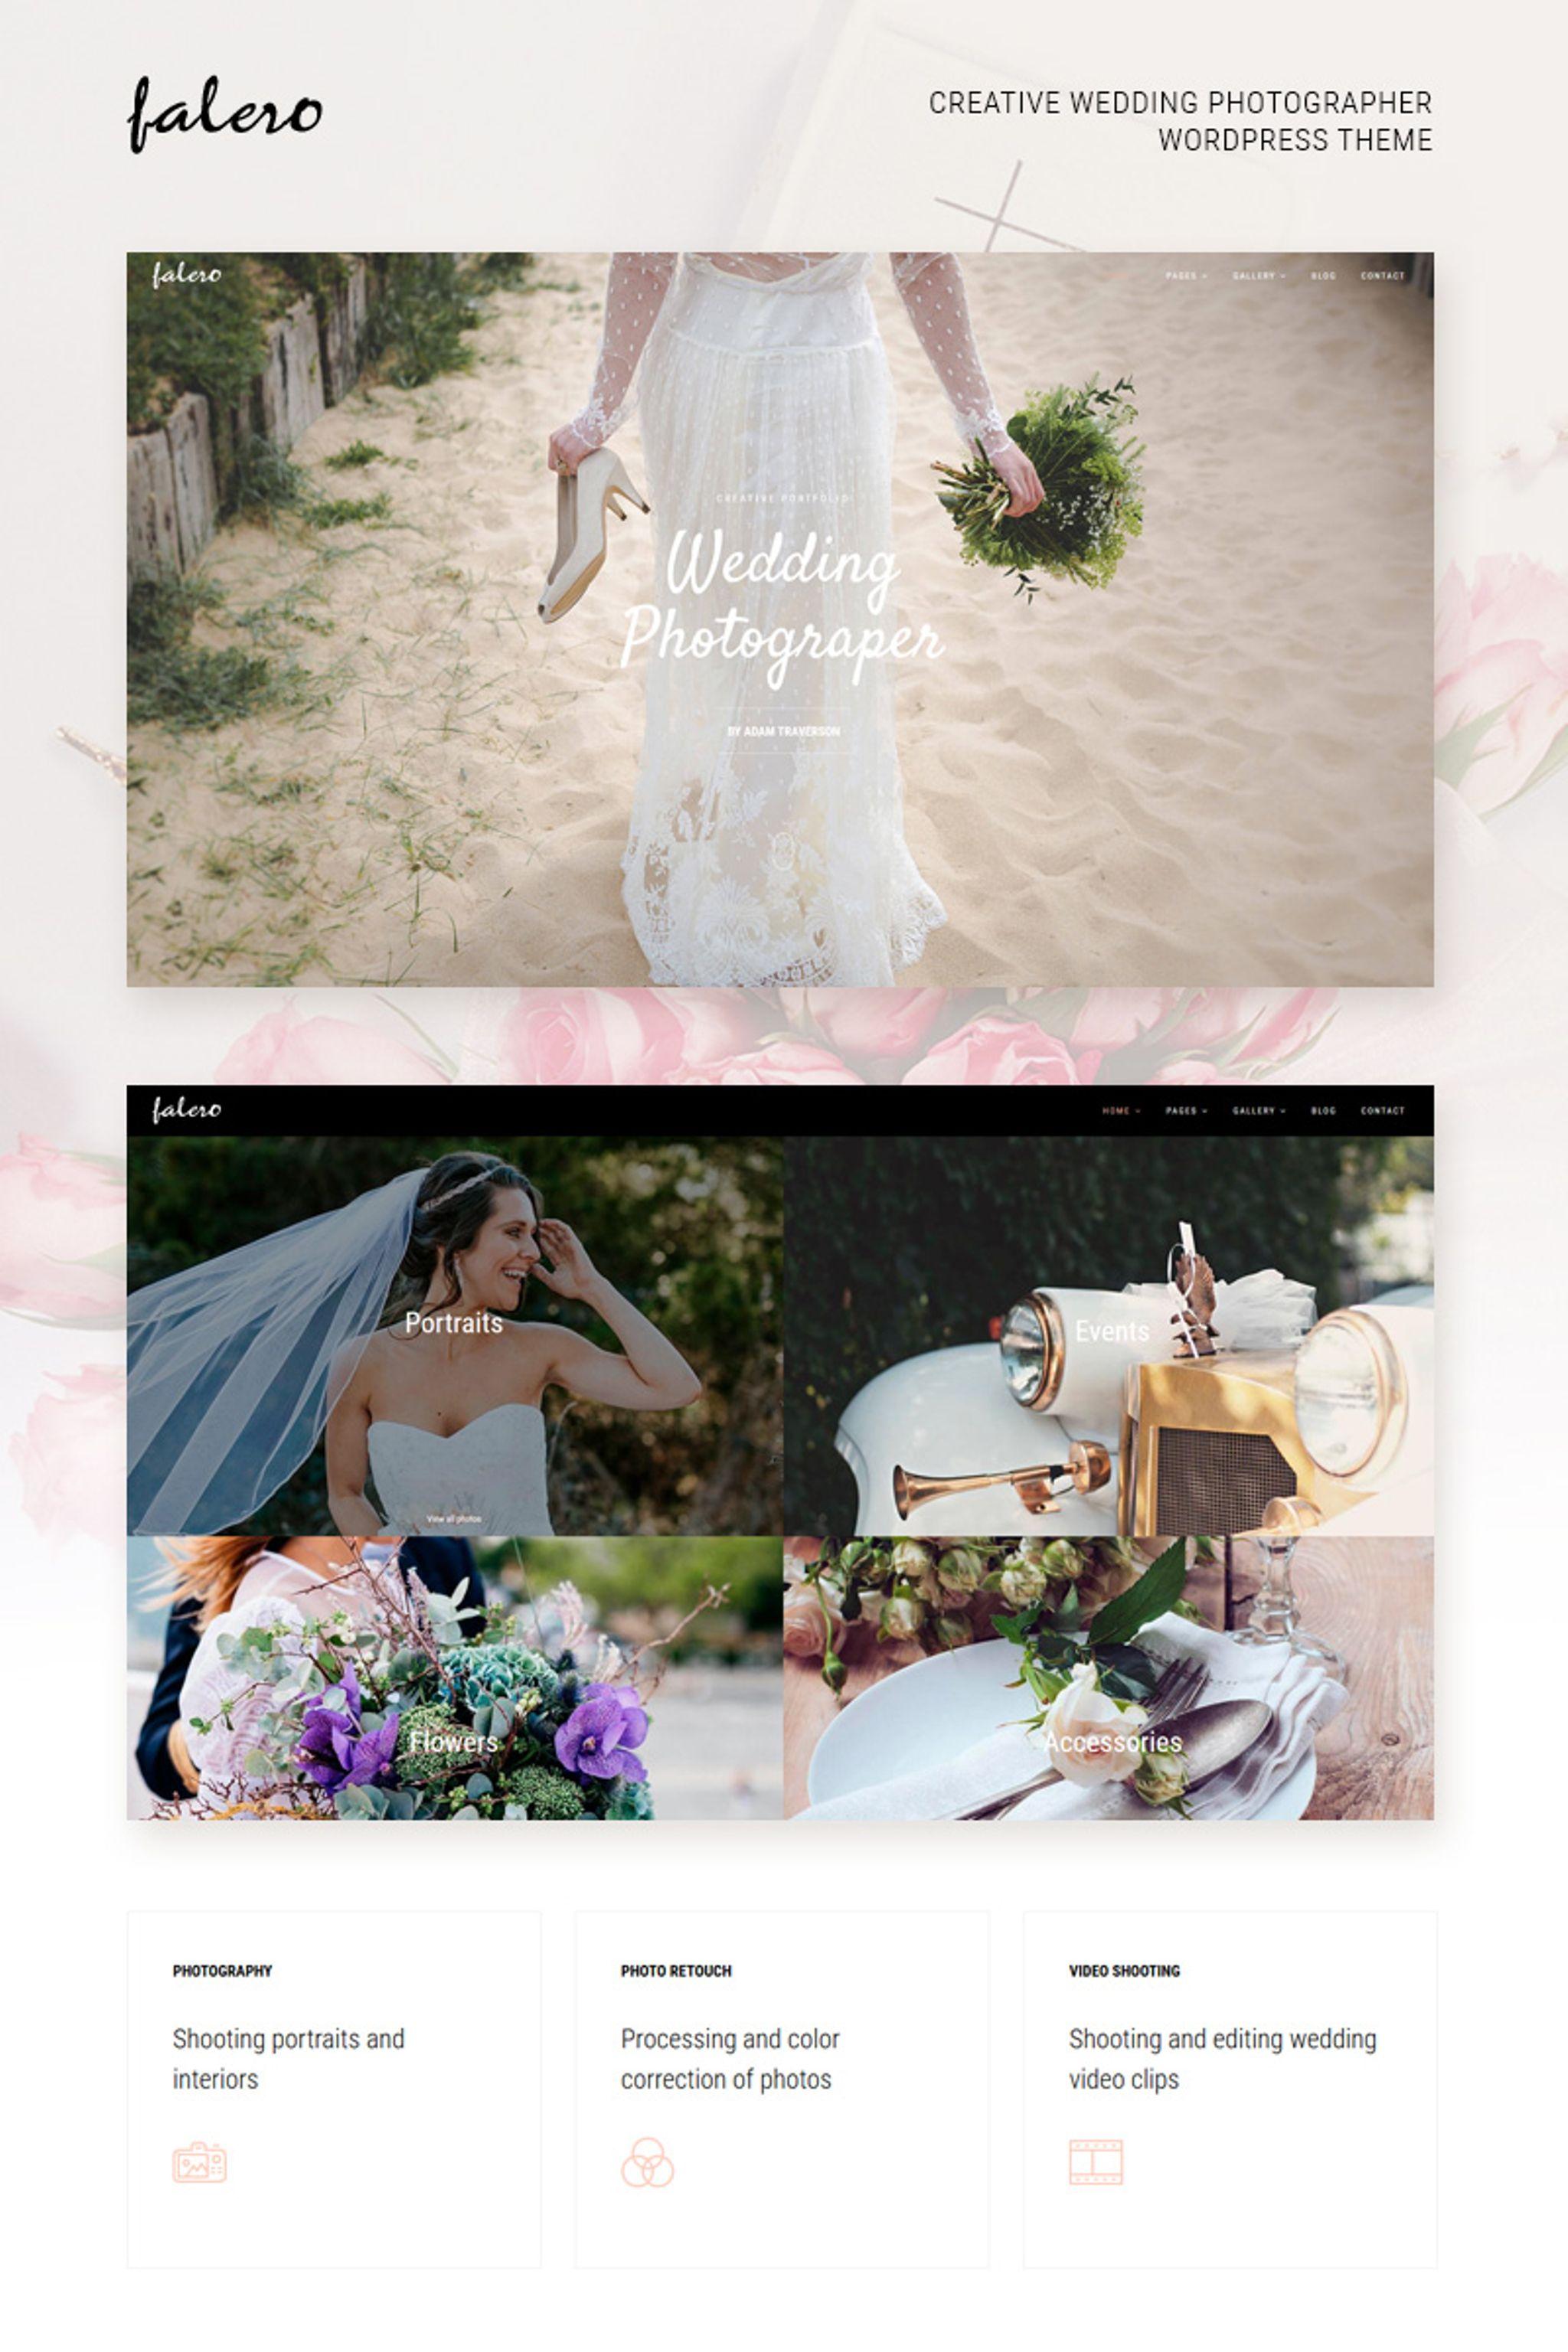 Reszponzív Falero Wedding Photographer WordPress sablon 64448